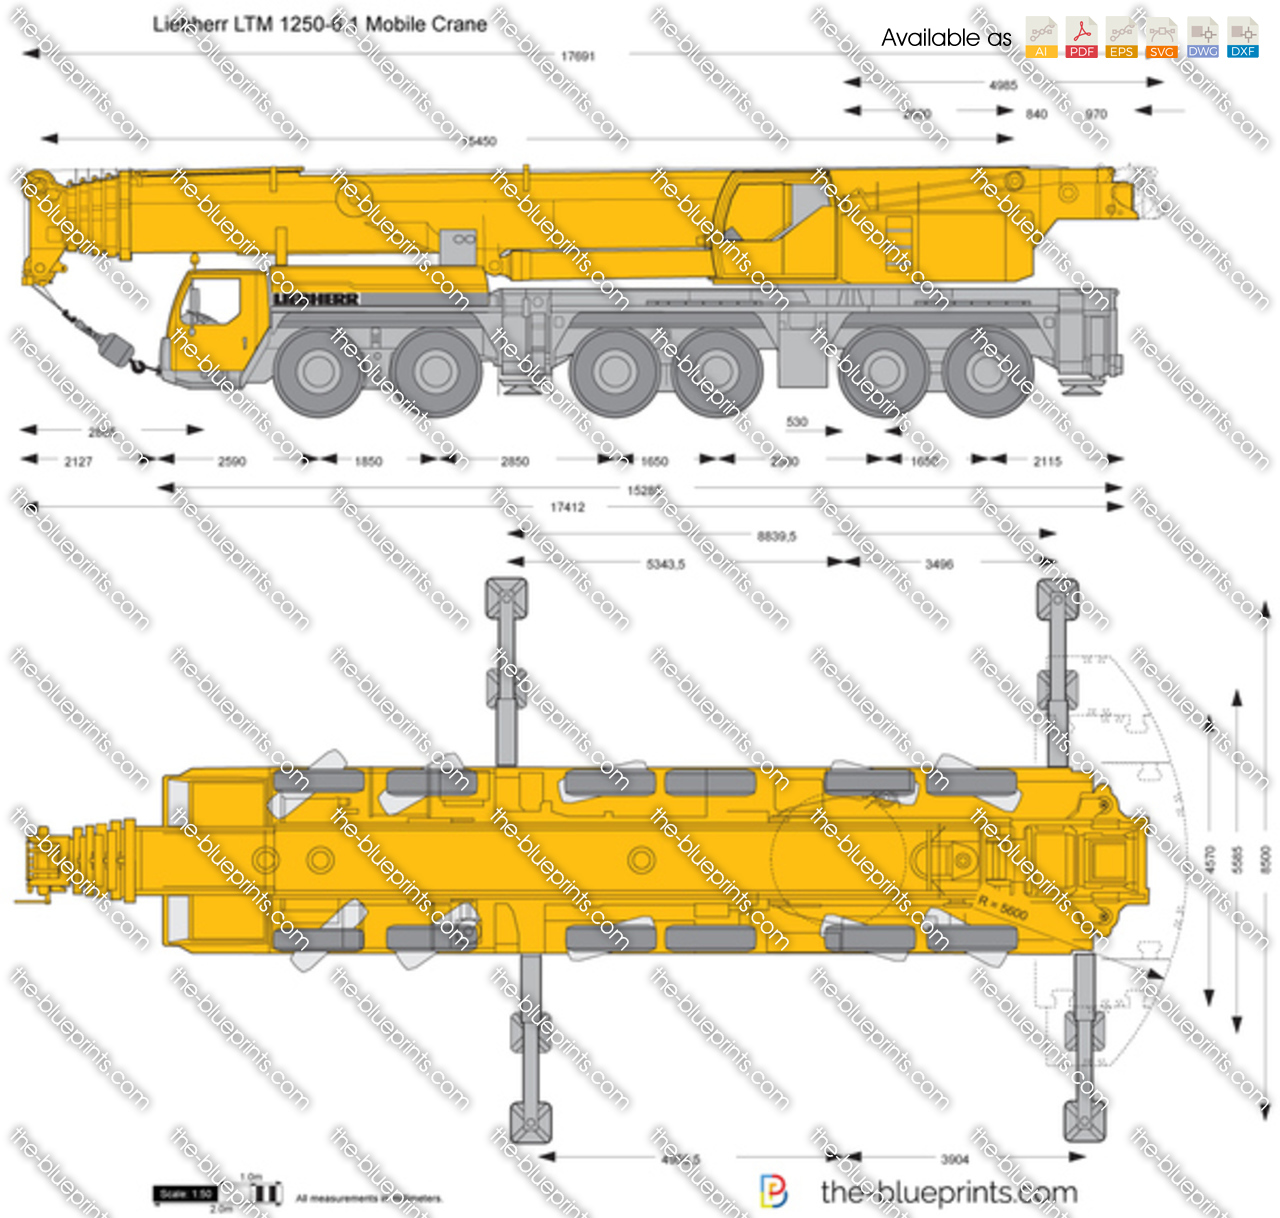 Liebherr LTM 1250-6.1 Mobile Crane